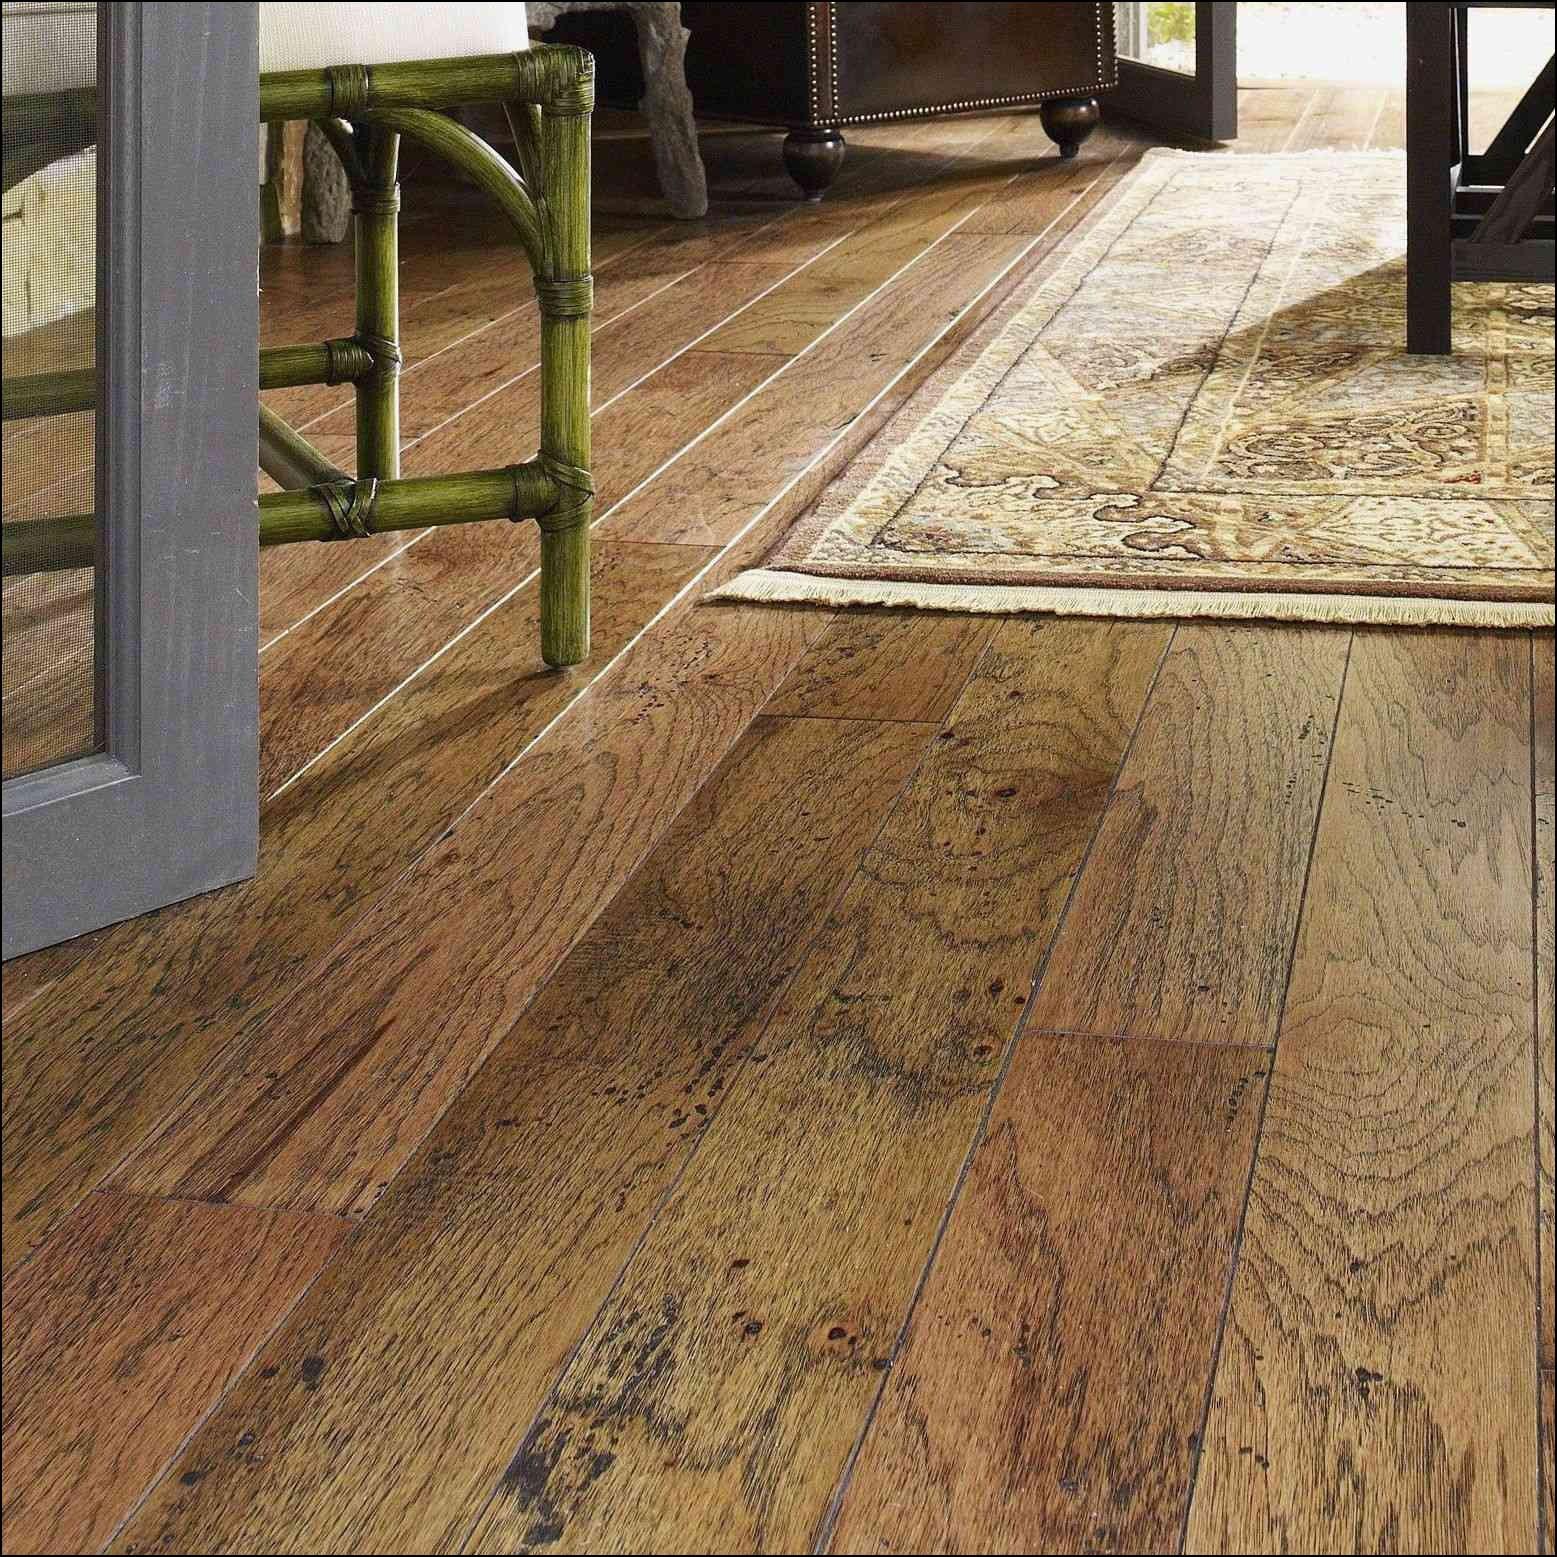 cheap engineered hardwood flooring of what is flooring ideas with regard to what is the best gym flooring images best type wood flooring best floor floor wood floor